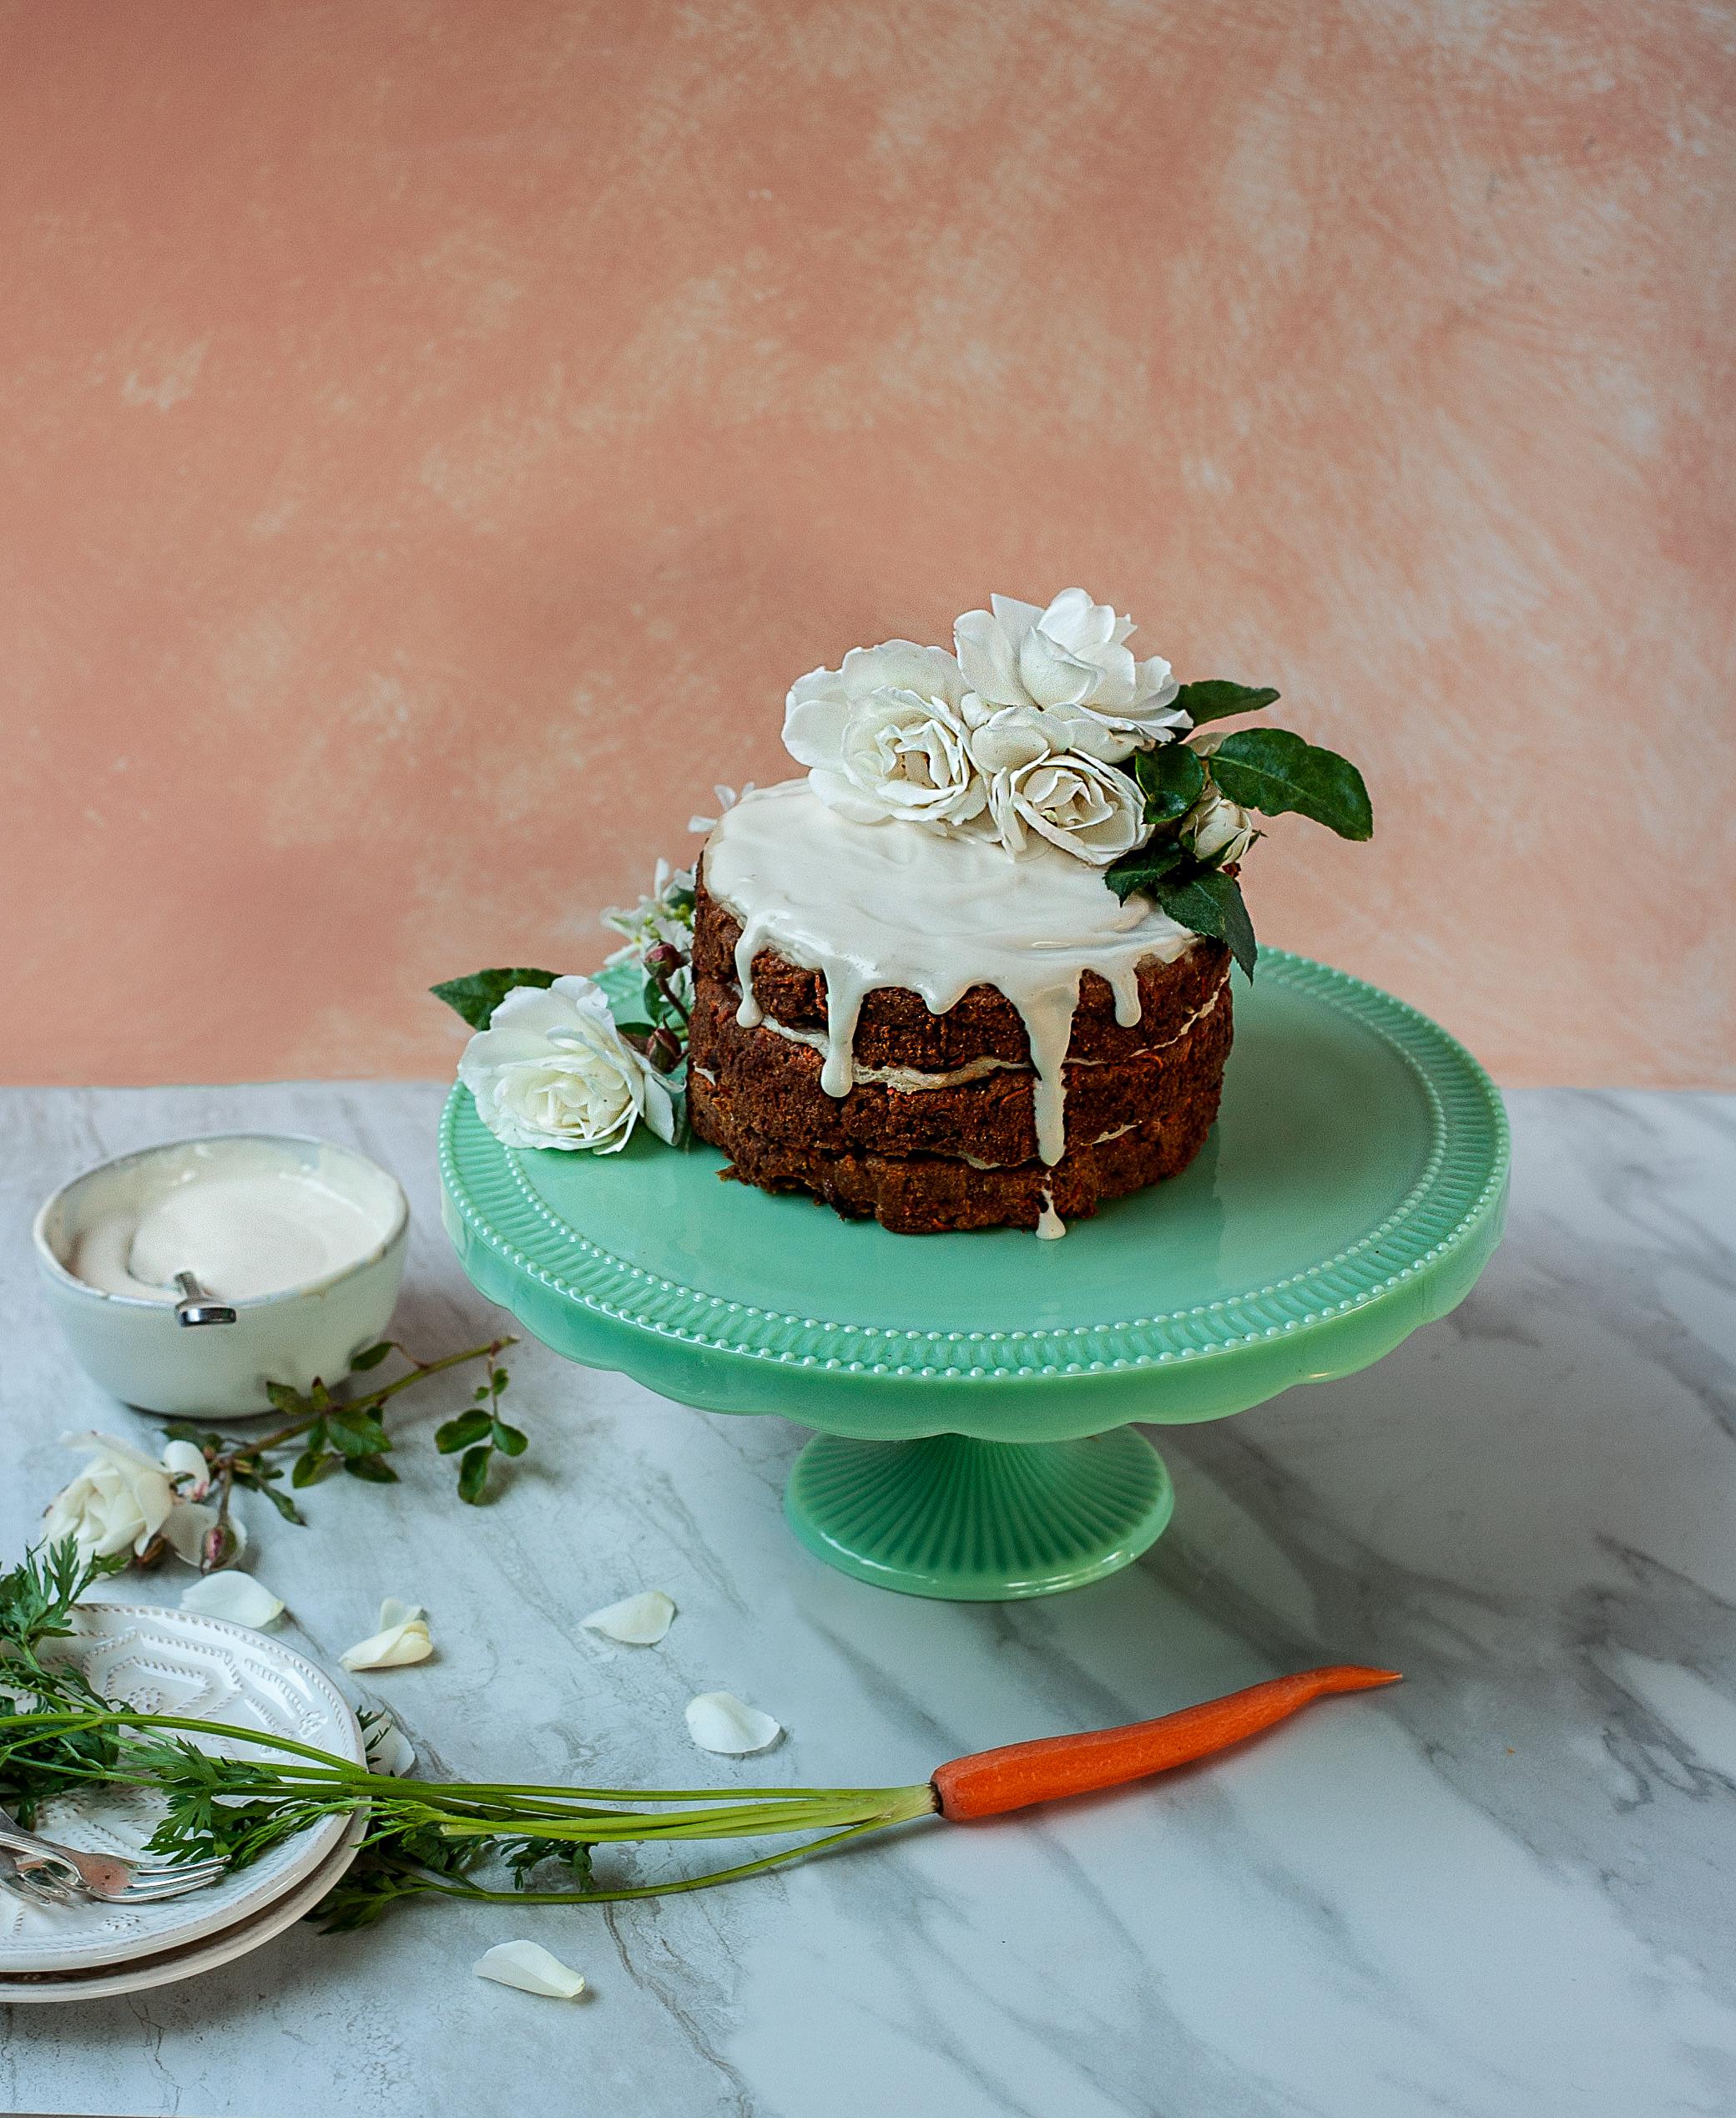 OATLY-carrot-cake-oatmilk-frosting-2.jpg